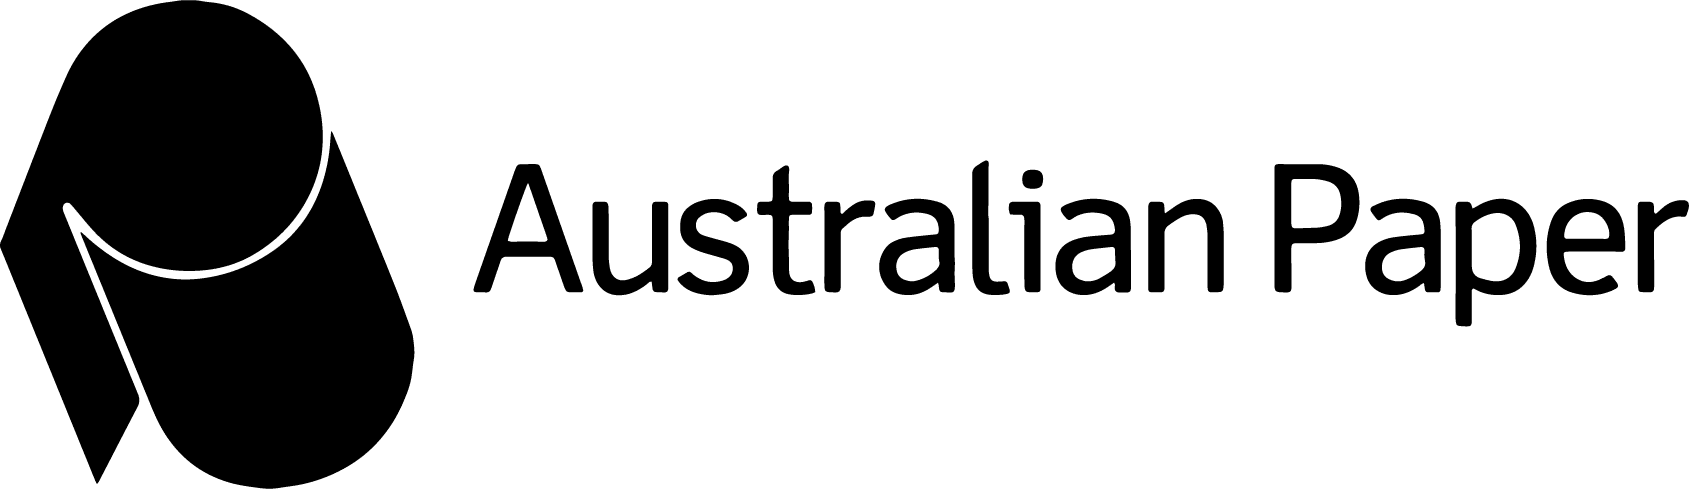 Australian Paper Logo